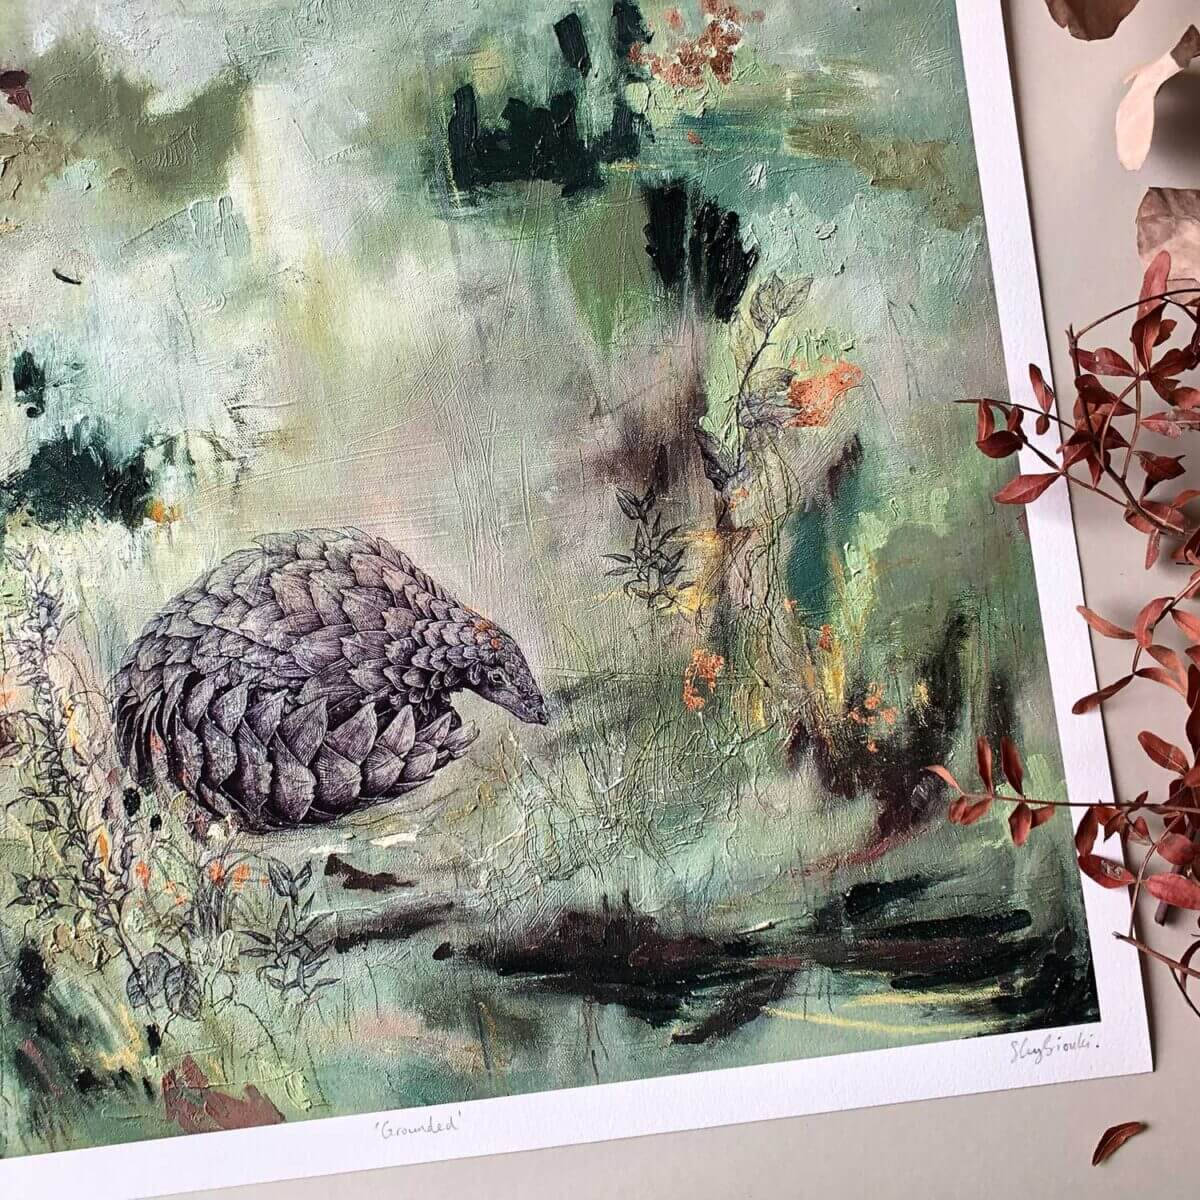 Grounded-Print-Pangolin-Sky-Siouki